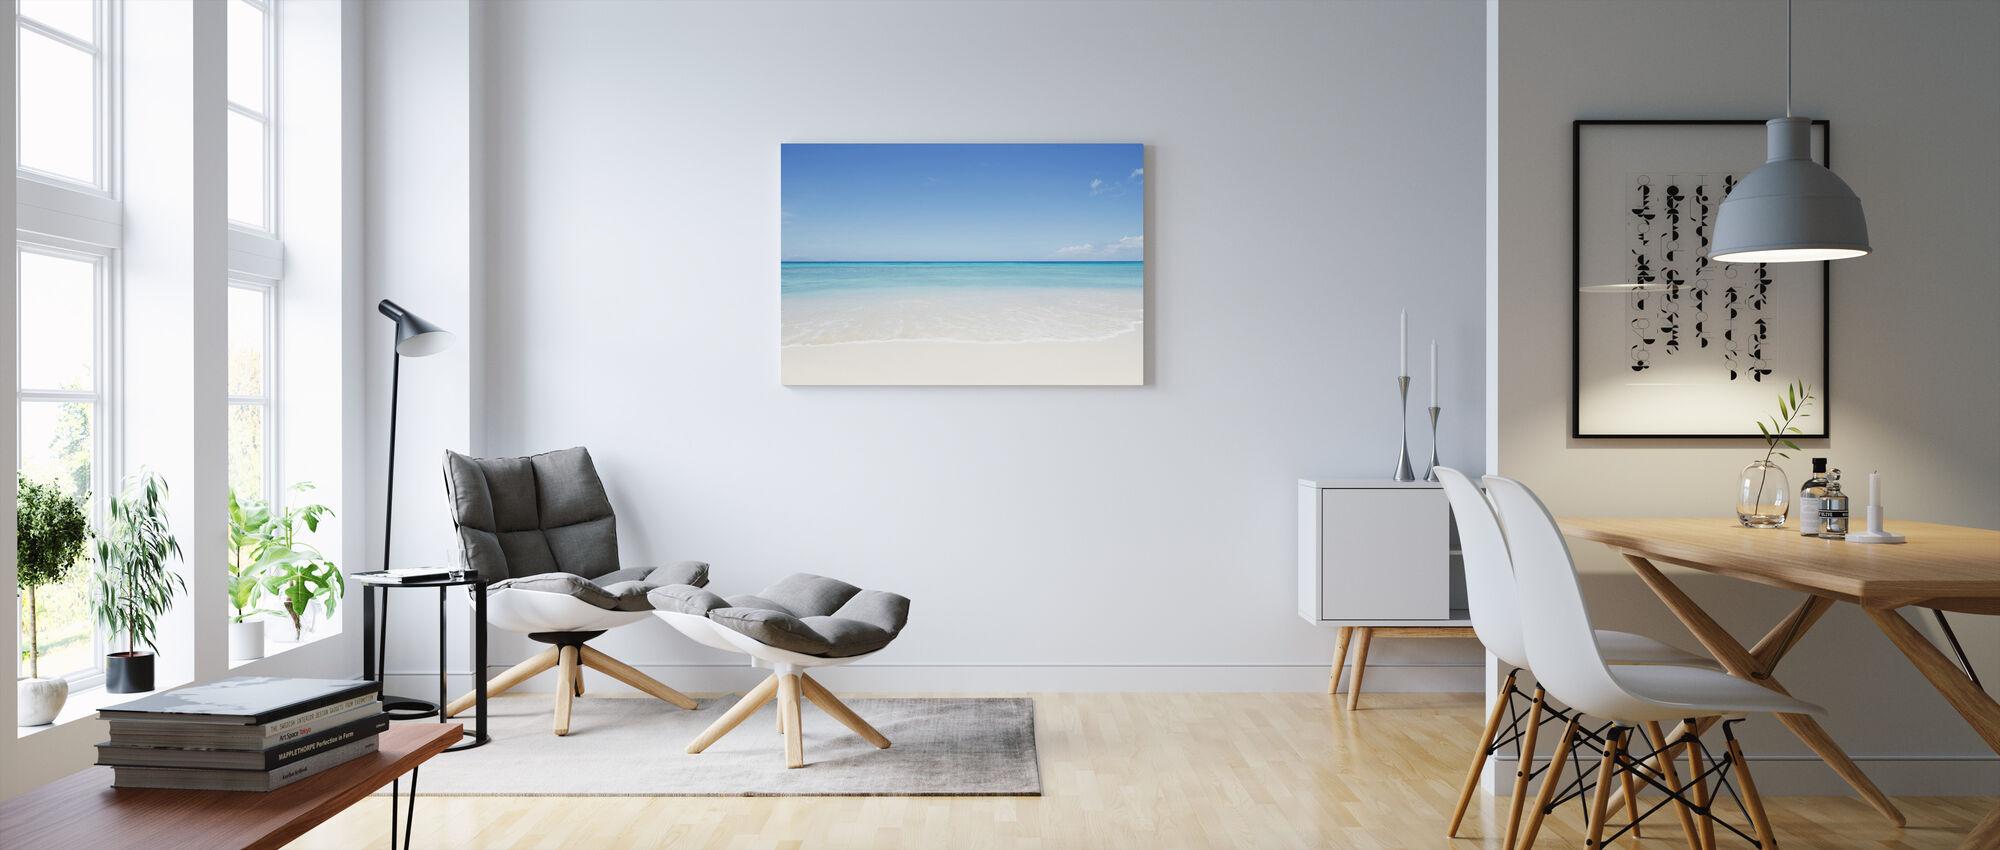 Perfekt Horisont - Canvastavla - Vardagsrum